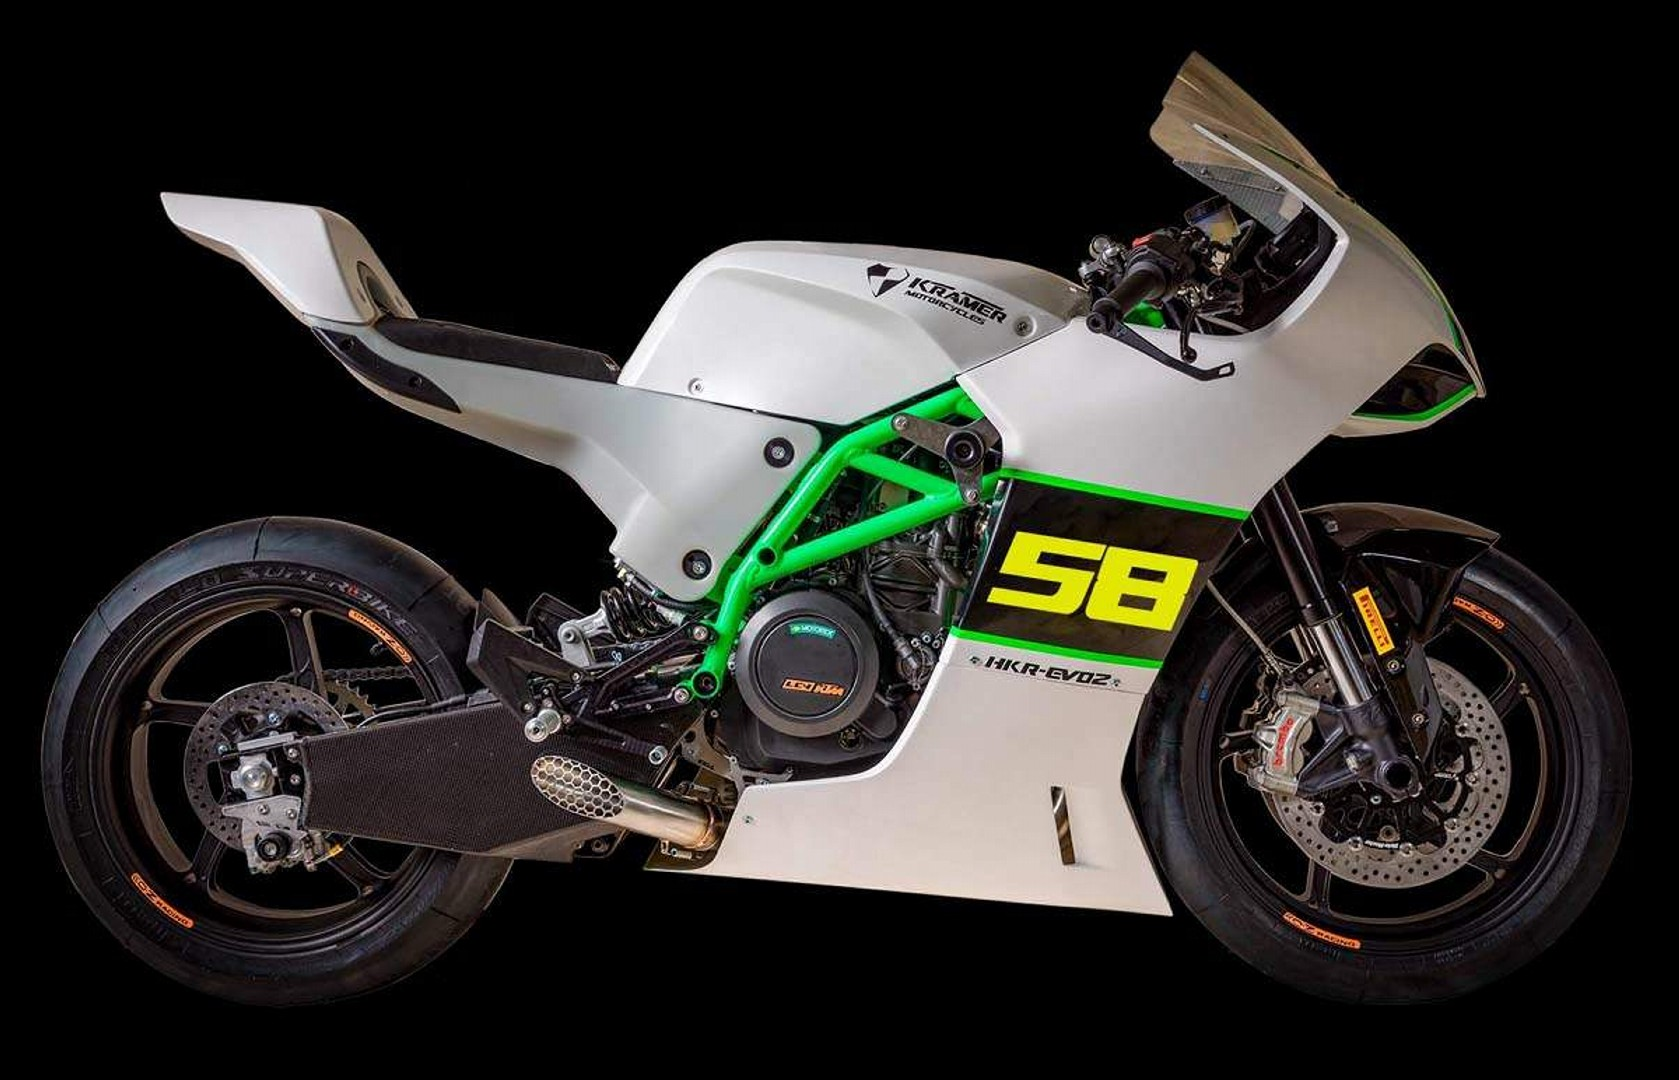 Moto del dia: Horex 644 Osca espíritu RACER moto